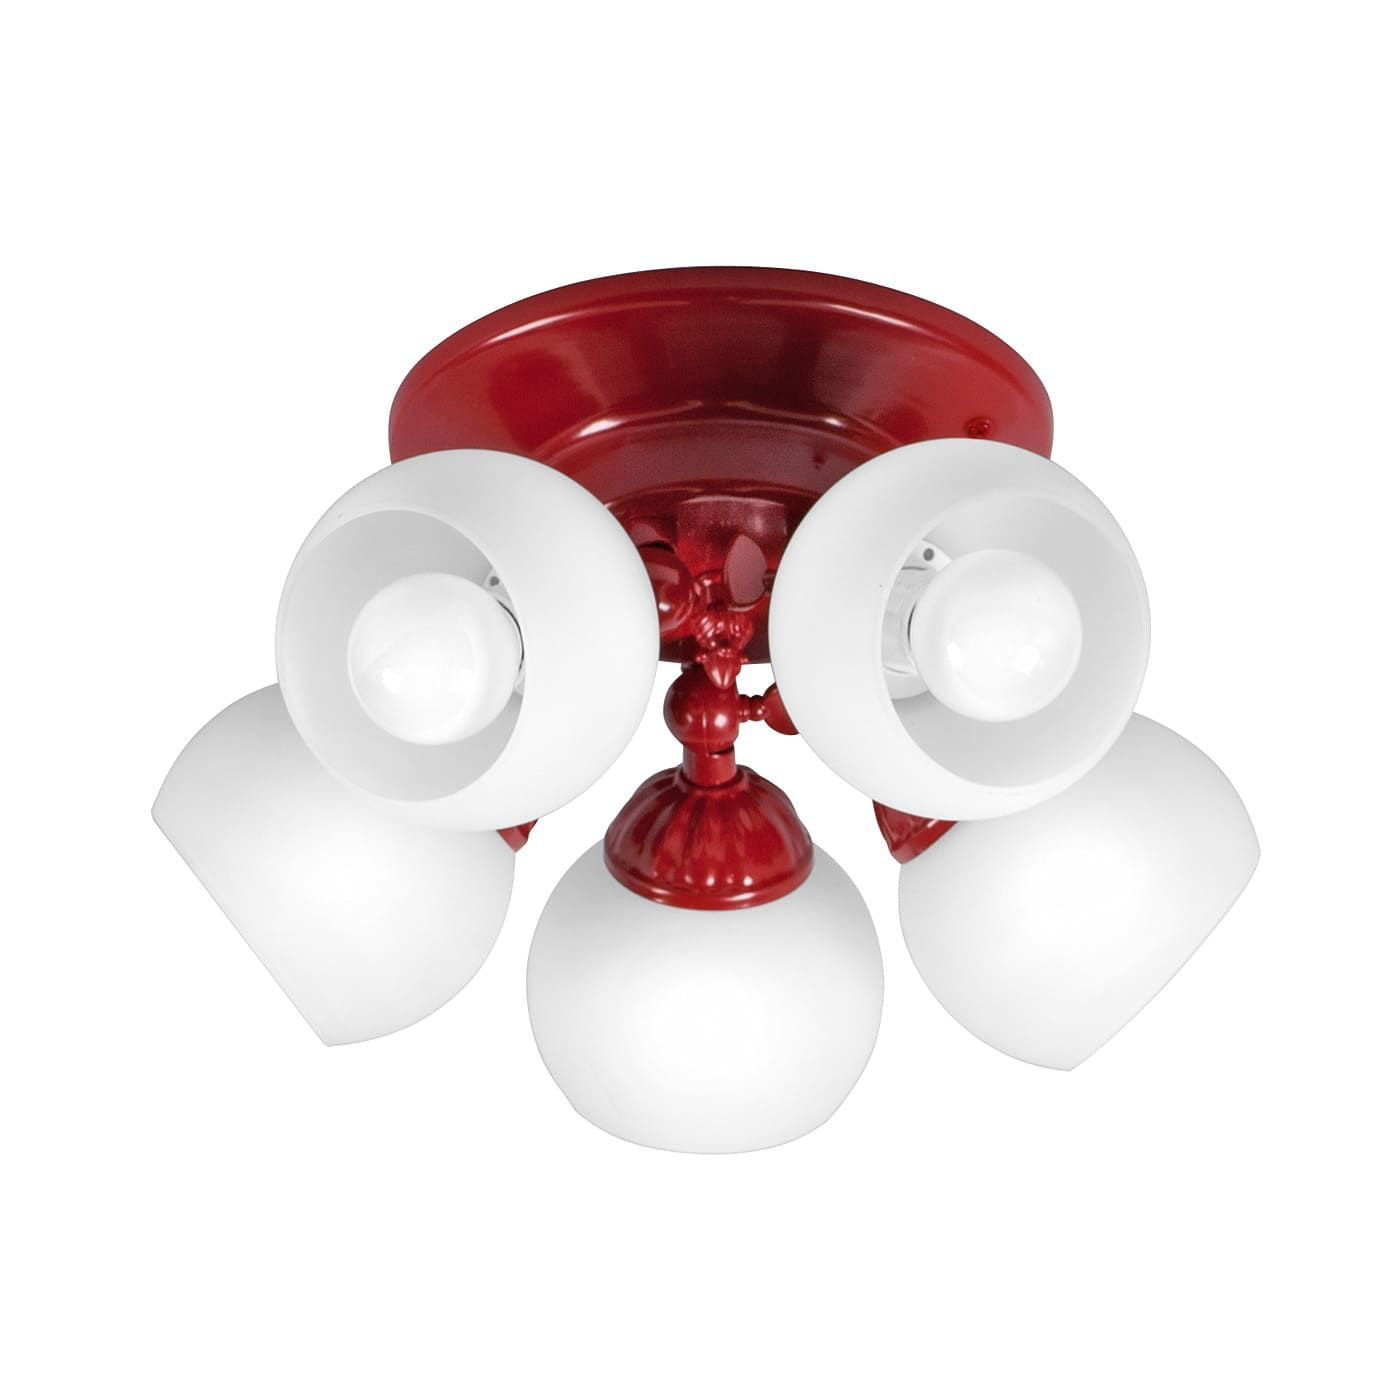 PETRASVET / Ceiling chandelier S2194-5, 5xE14 max. 60W